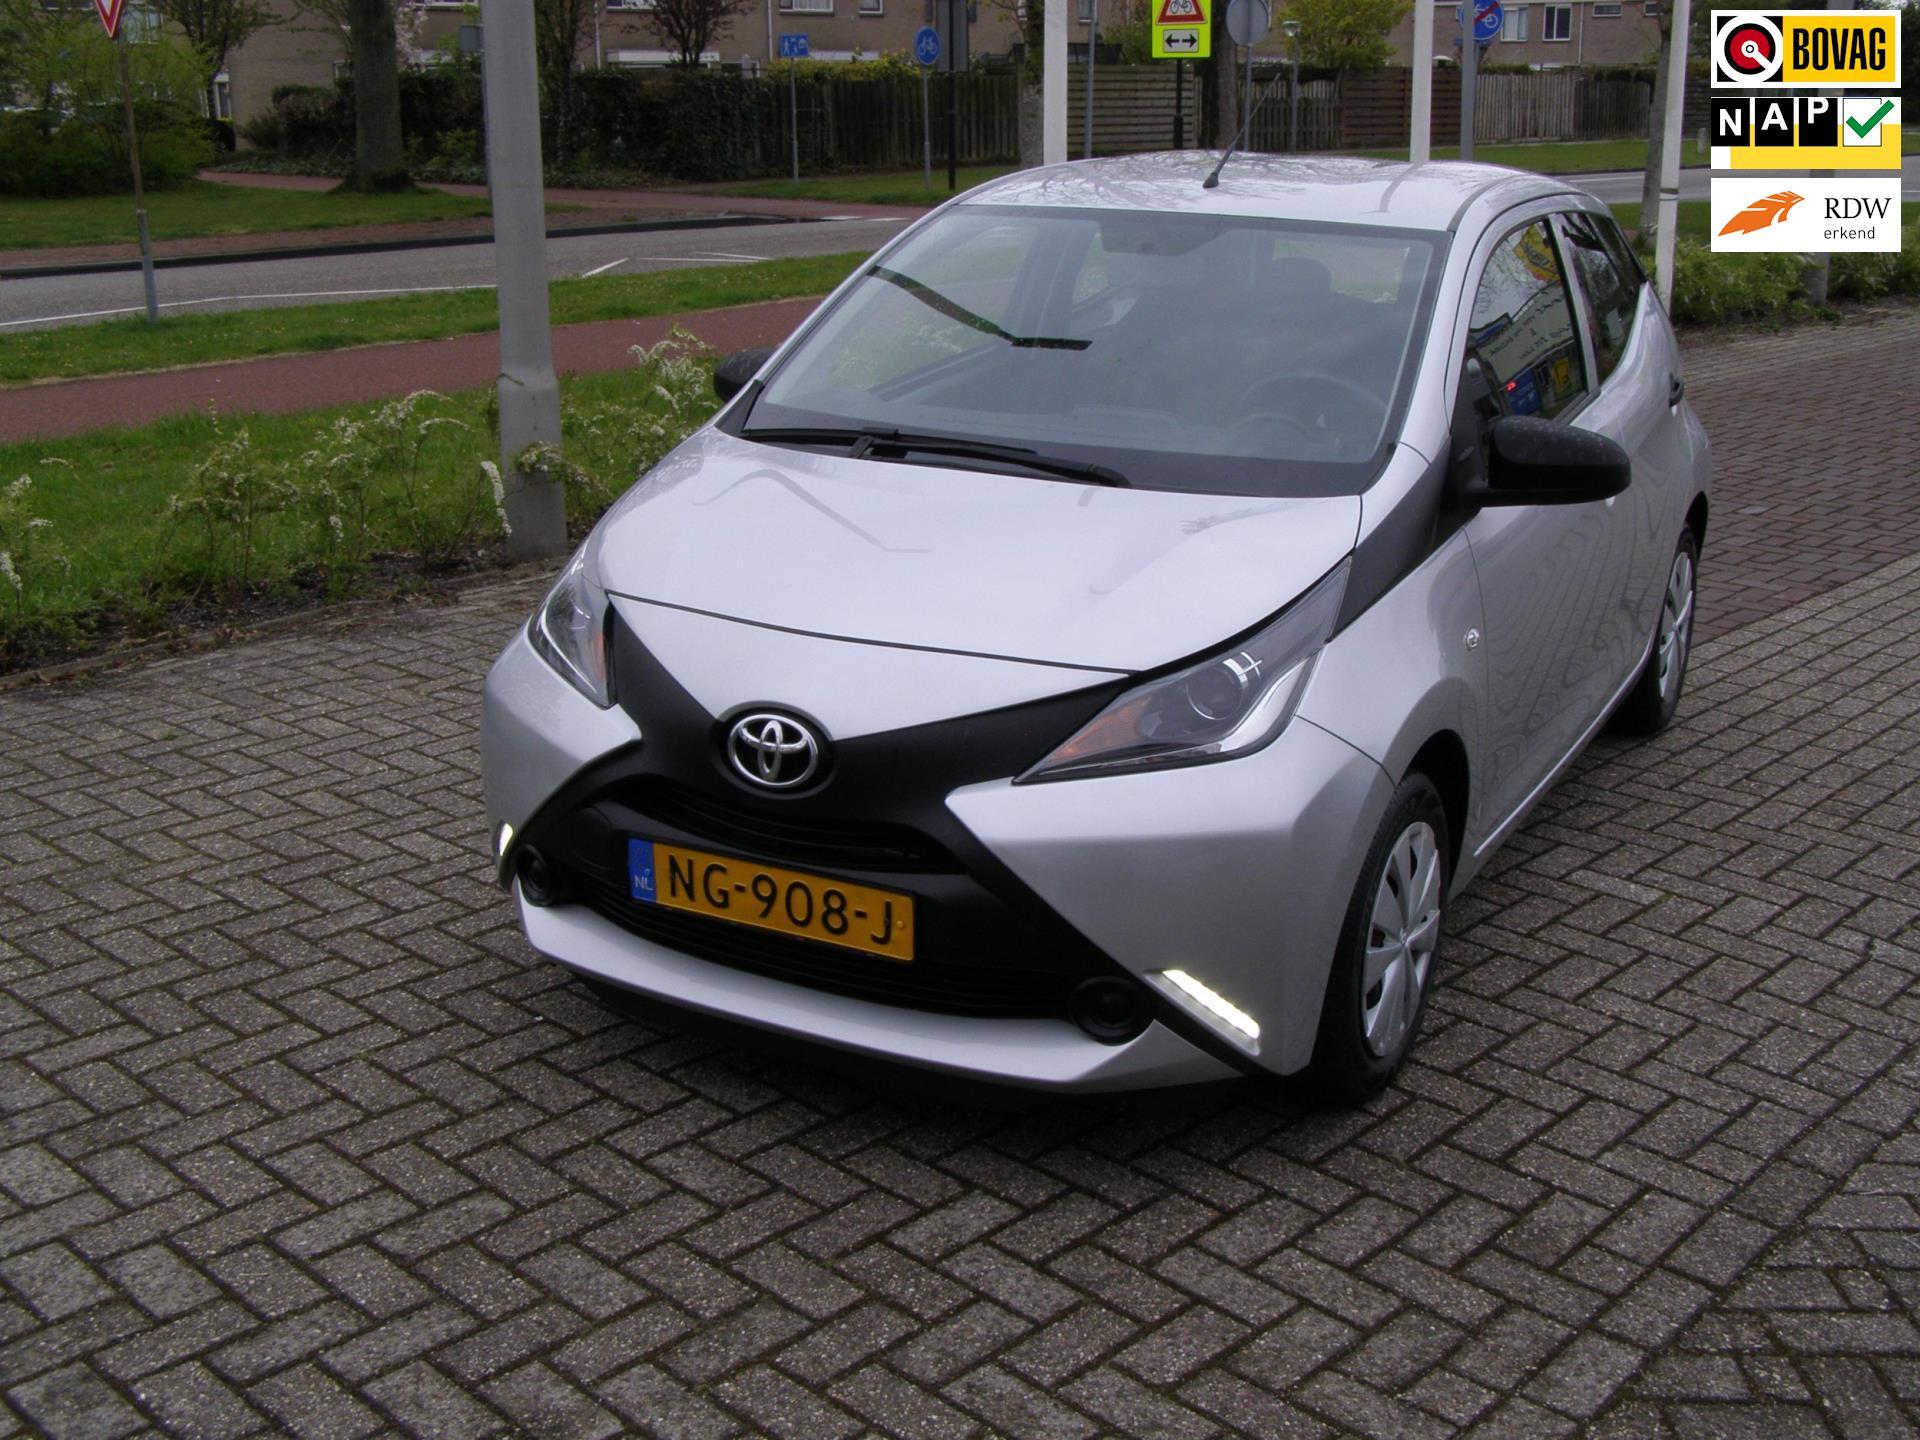 Toyota Aygo occasion - Occasion Centrum Lelystad